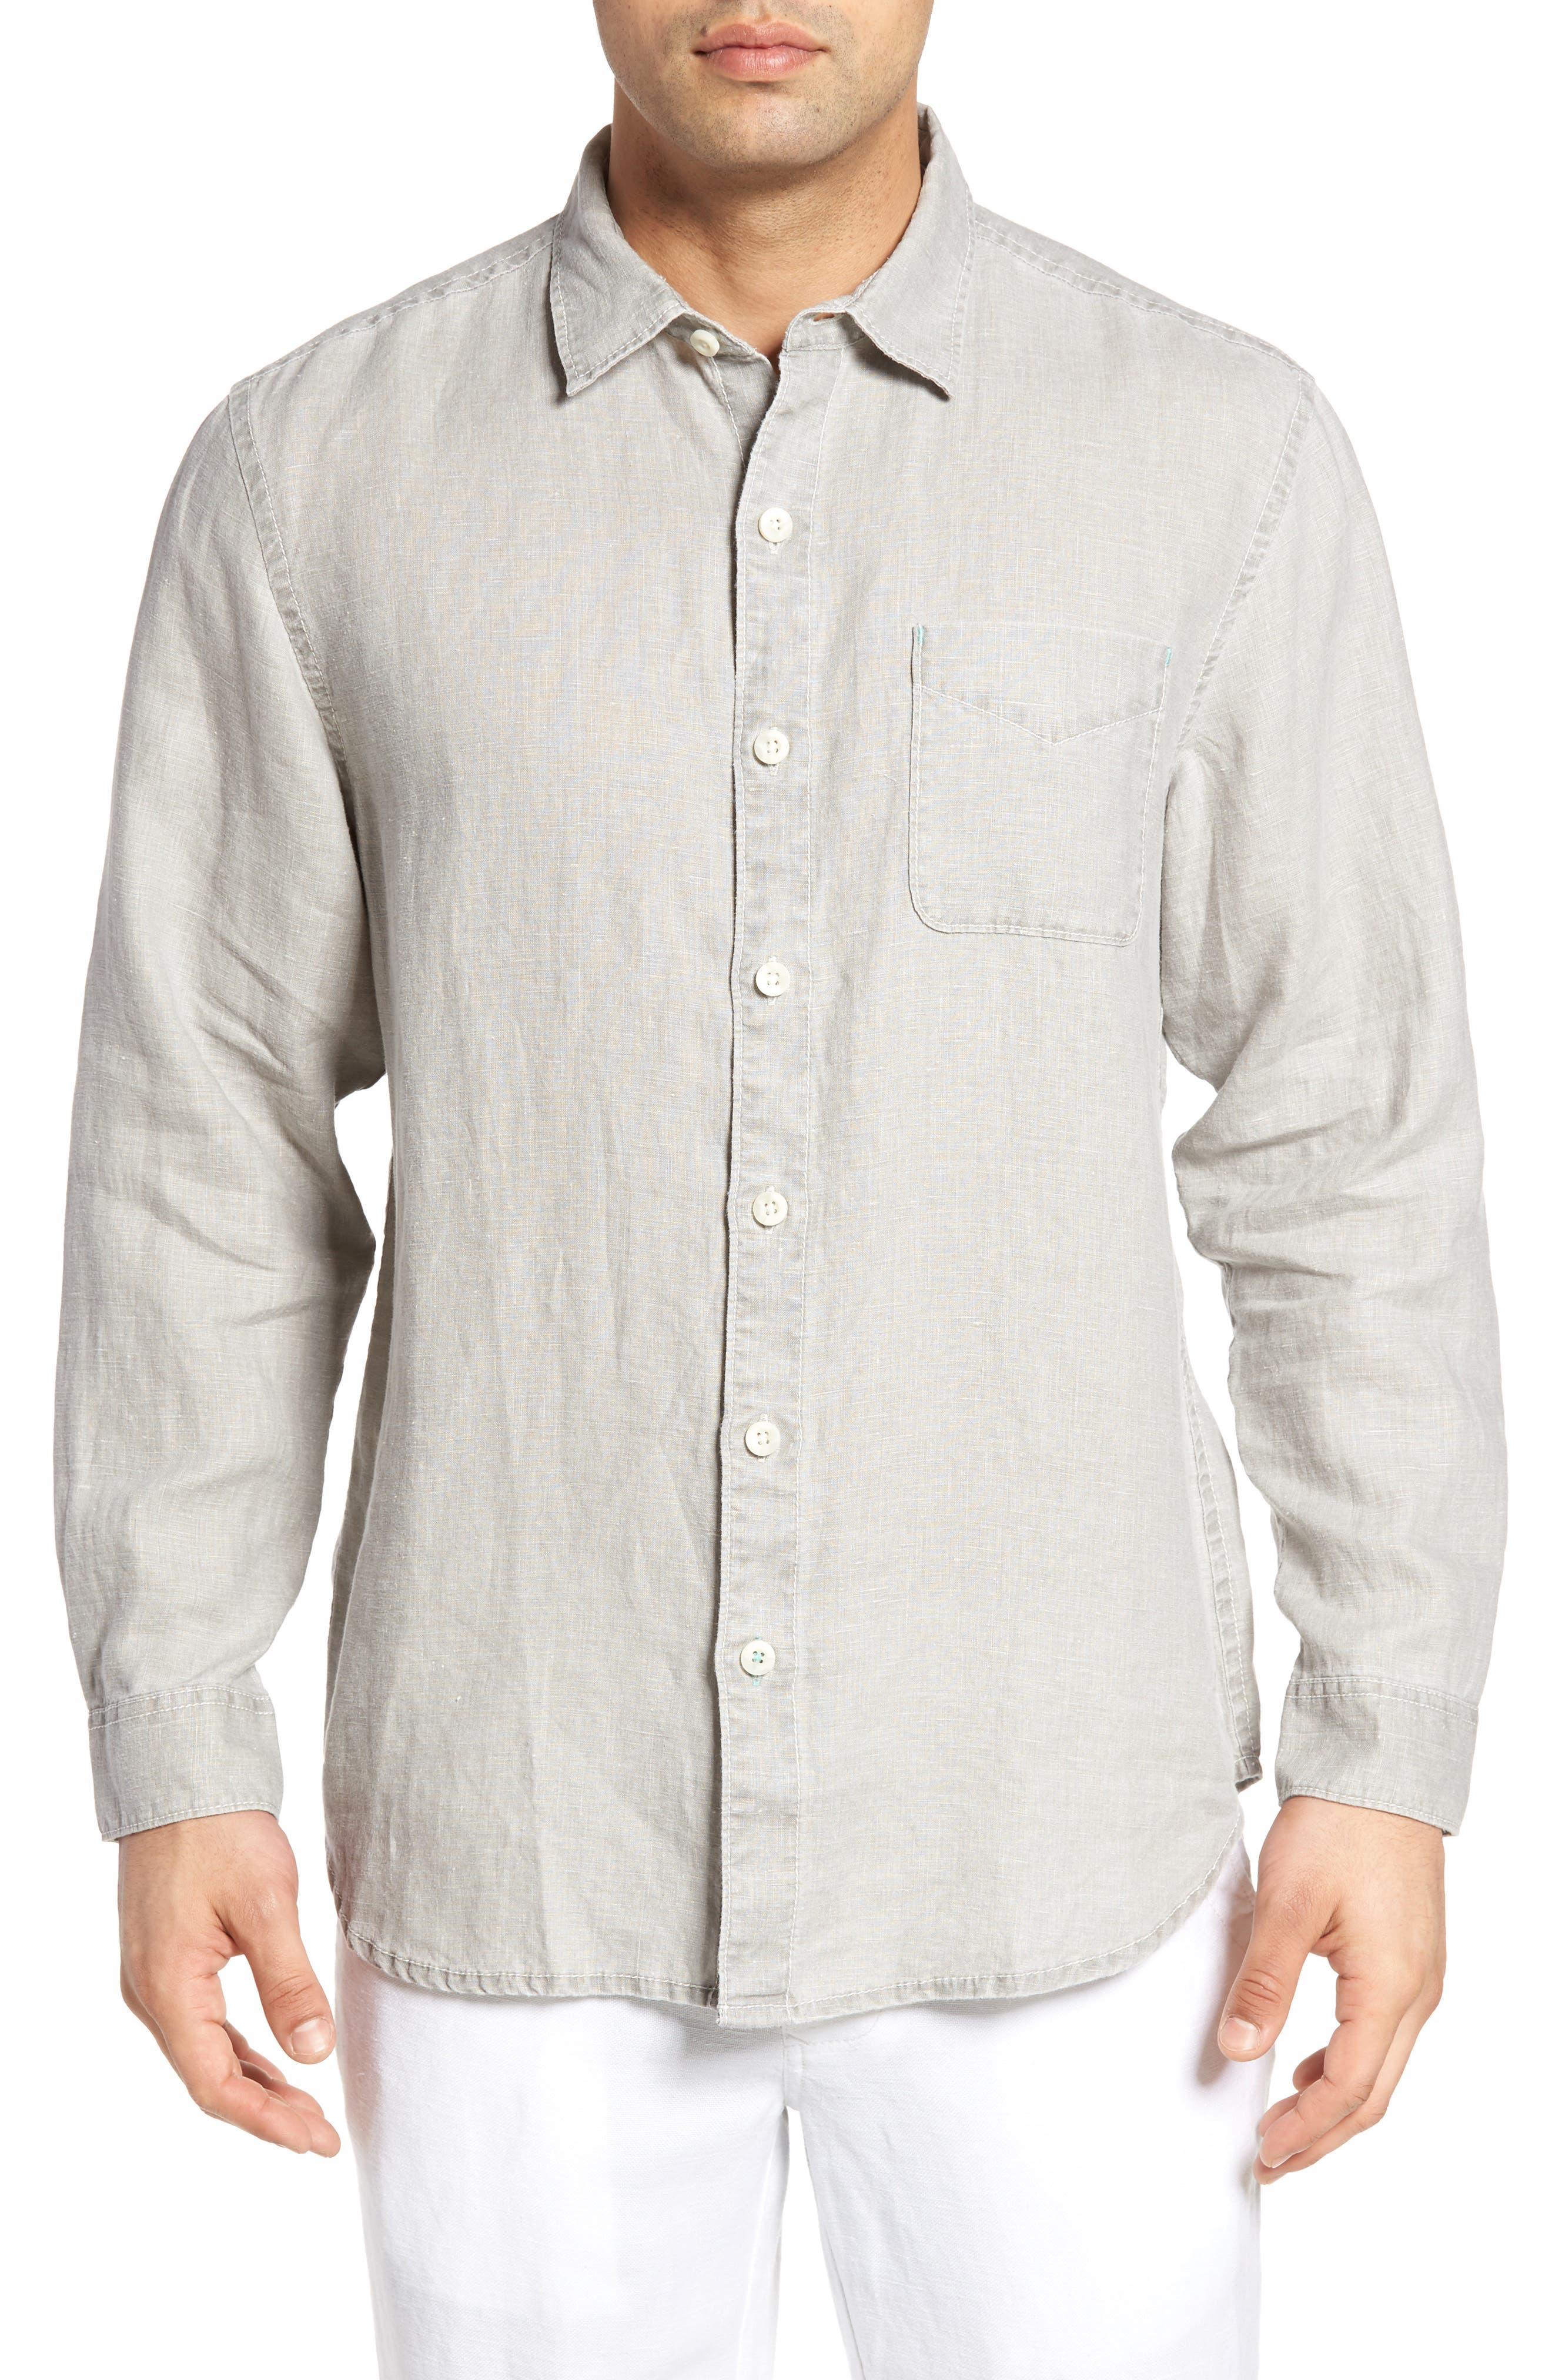 'Sea Glass Breezer' Original Fit Linen Shirt,                             Main thumbnail 1, color,                             050